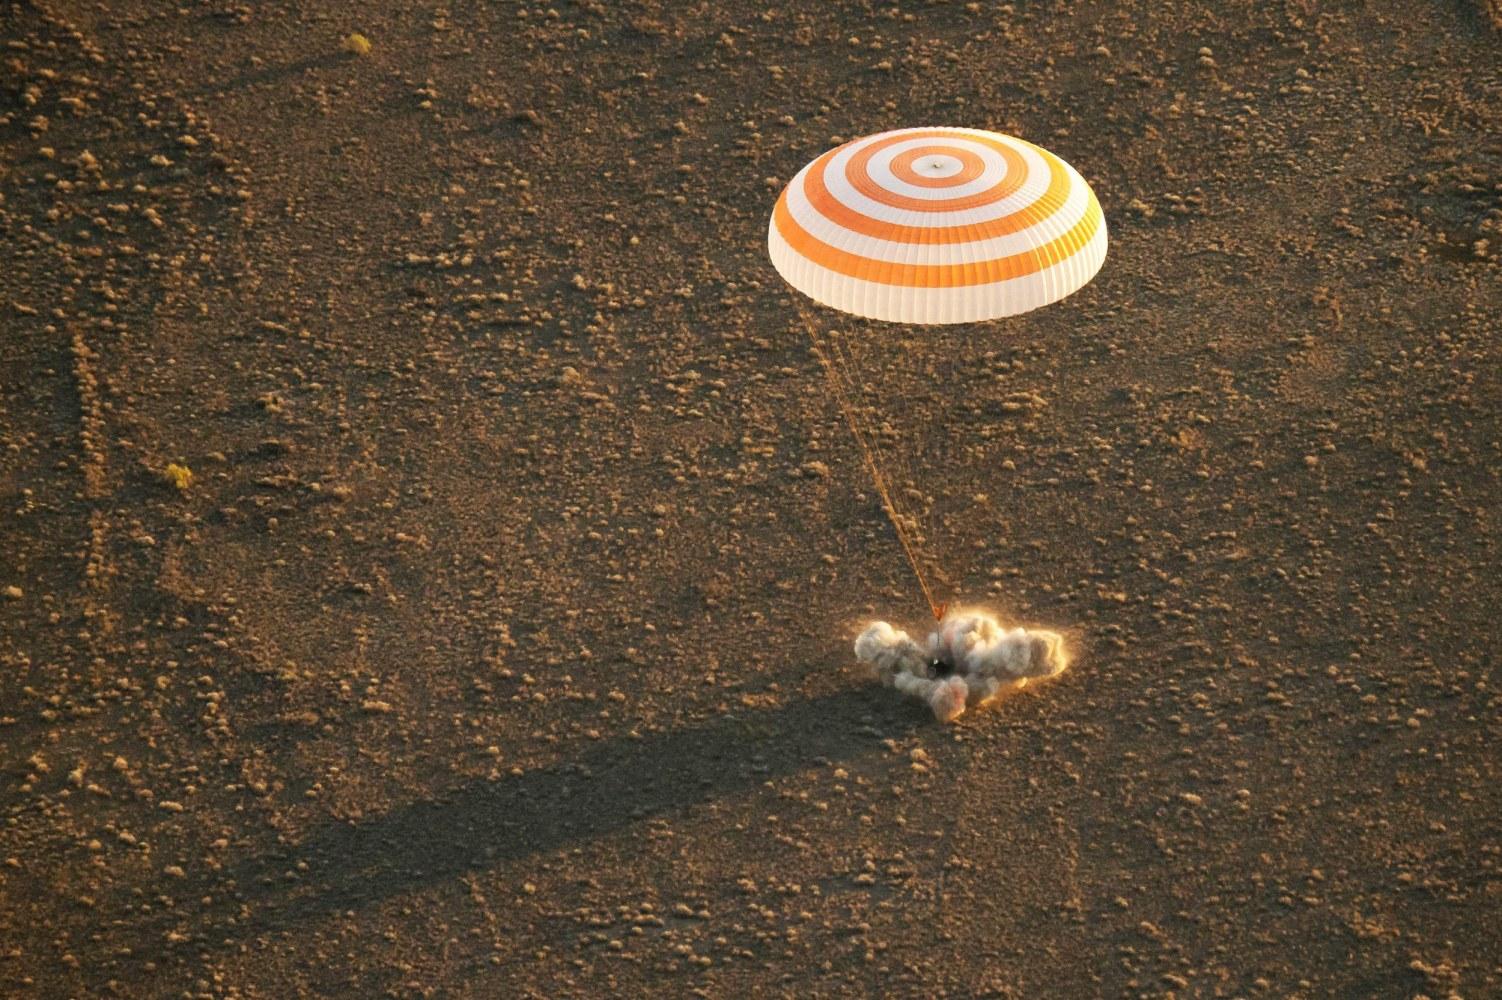 russian spacecraft landing - photo #7